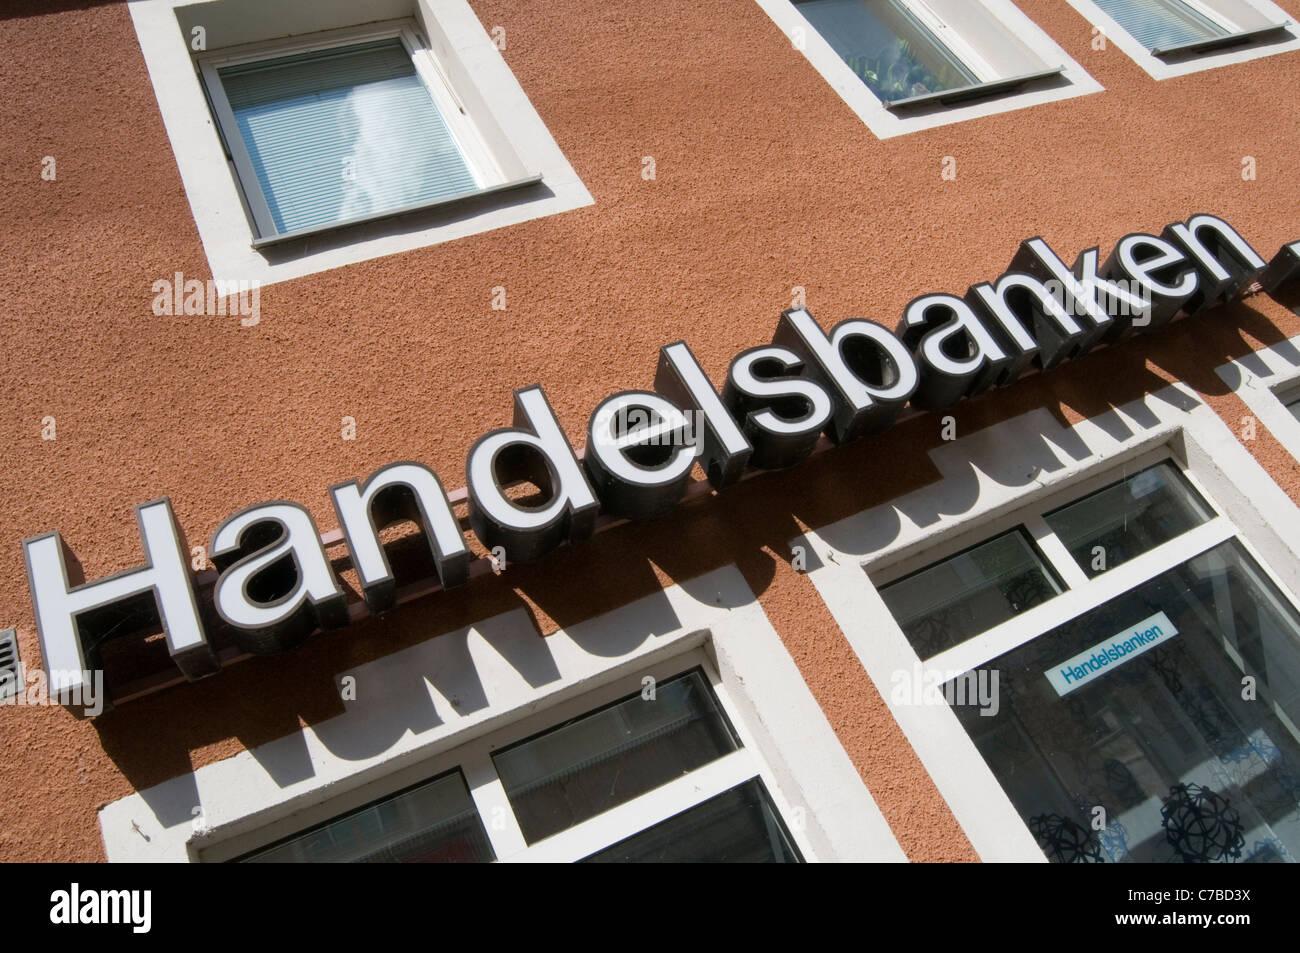 handlesbanken Svenska swedish bank banks high street highstreet banking sweden - Stock Image